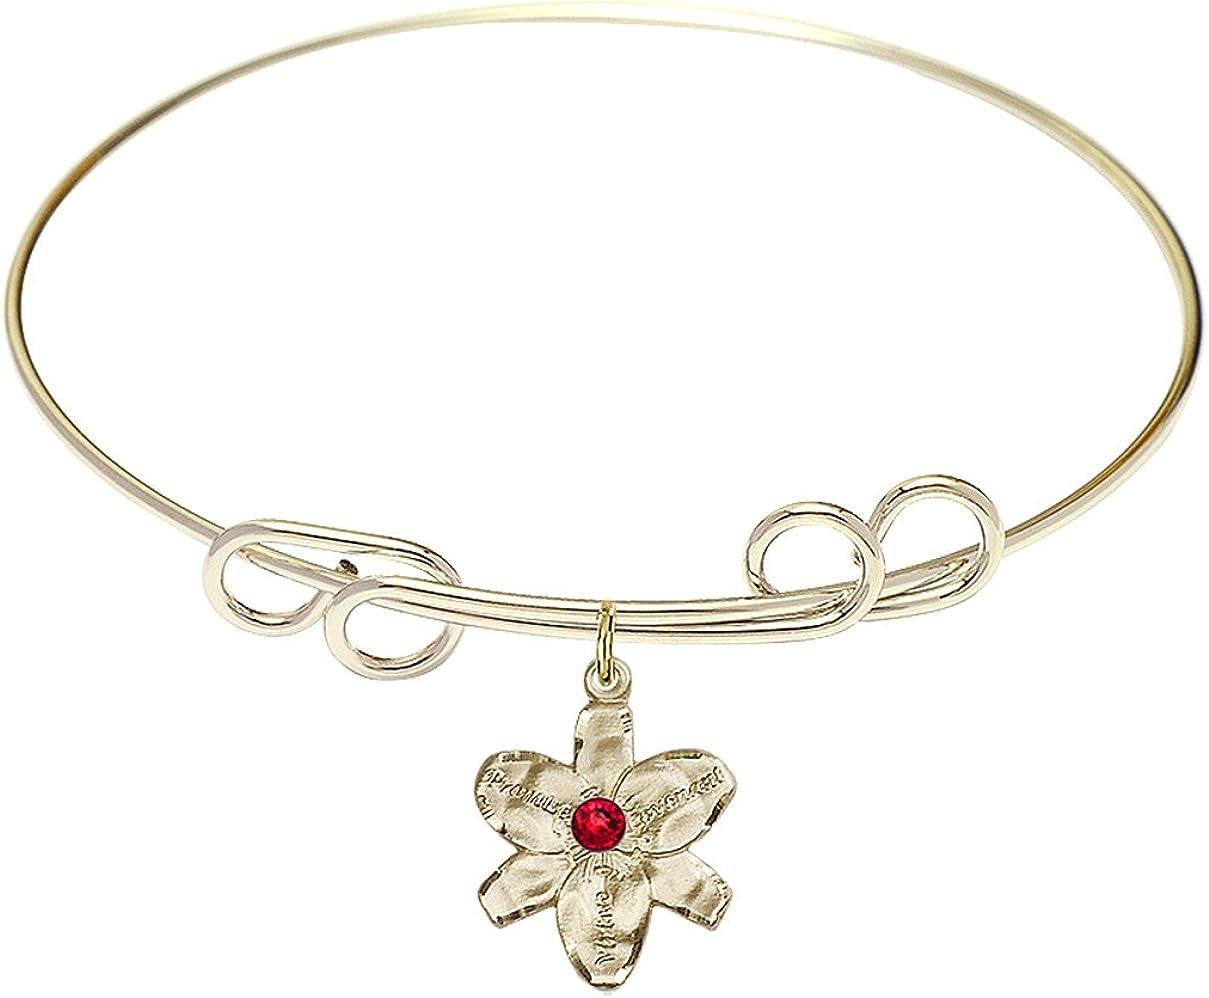 DiamondJewelryNY Double Loop Bangle Save money Bracelet with Lowest price challenge Chastity a Cha